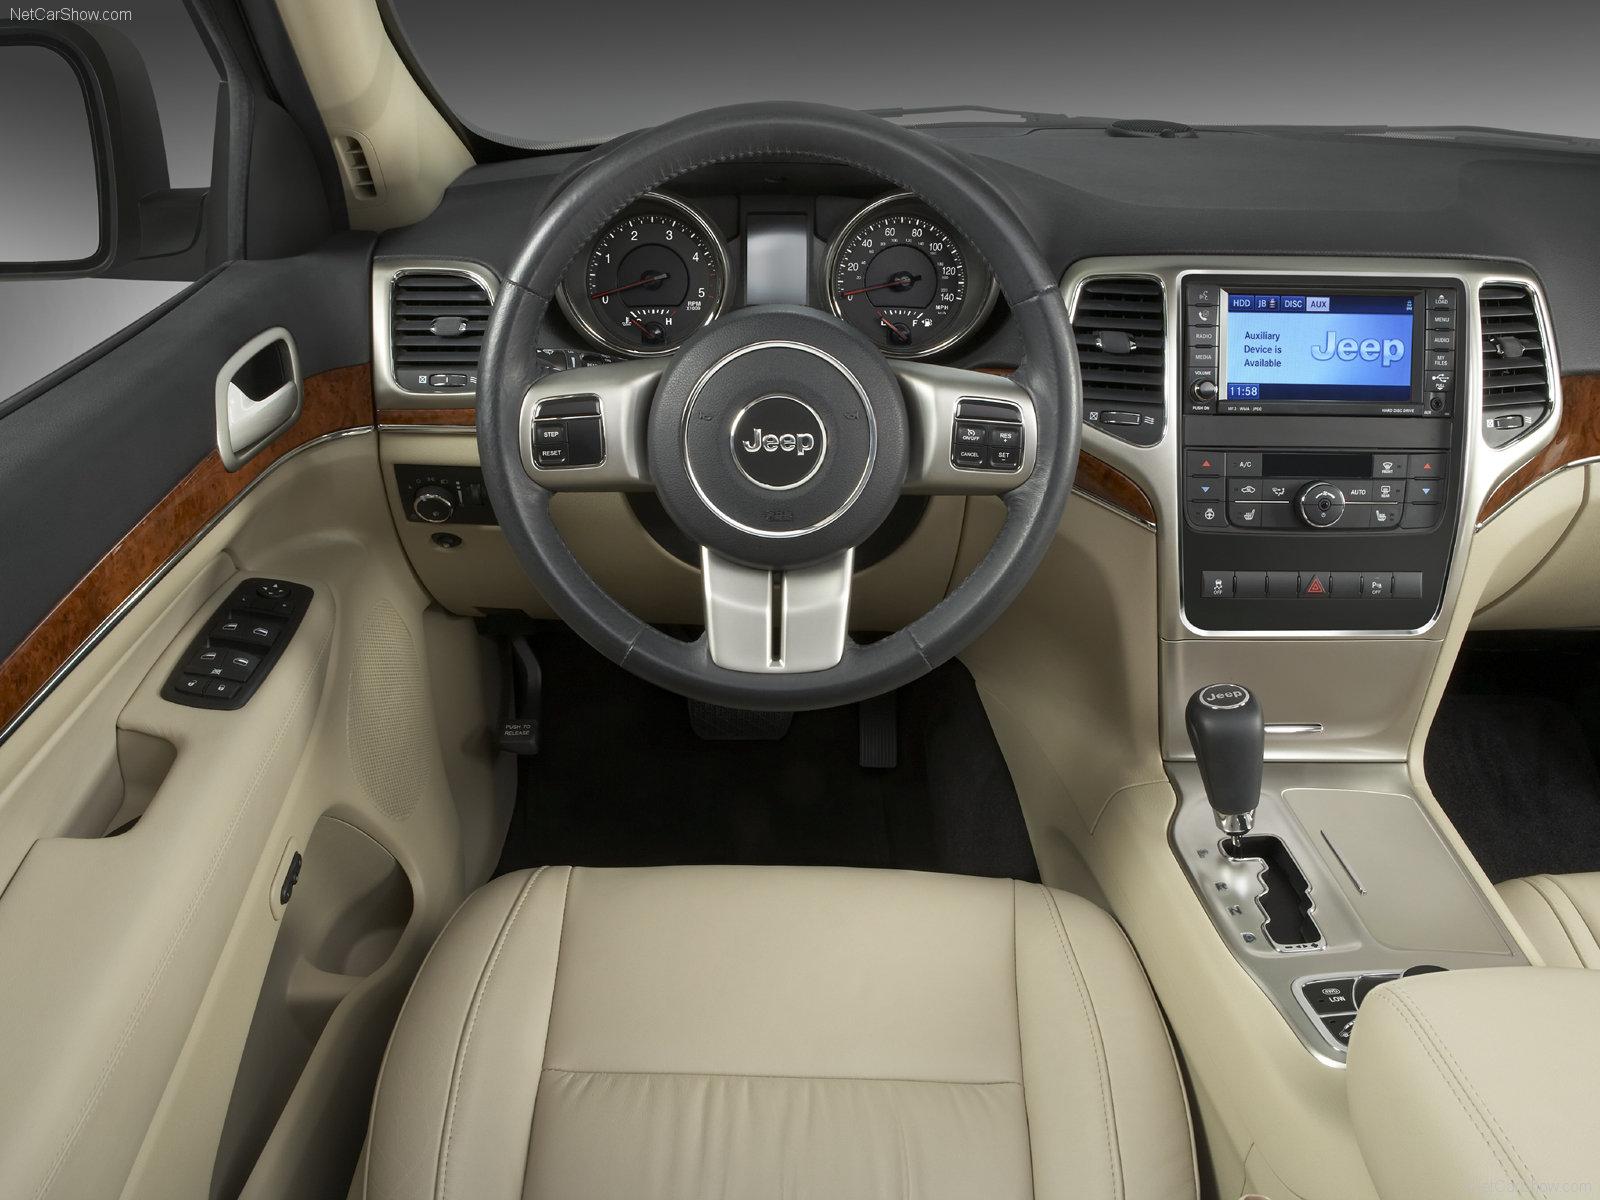 3dtuning of jeep grand cherokee suv 2011 - 2010 jeep grand cherokee interior ...